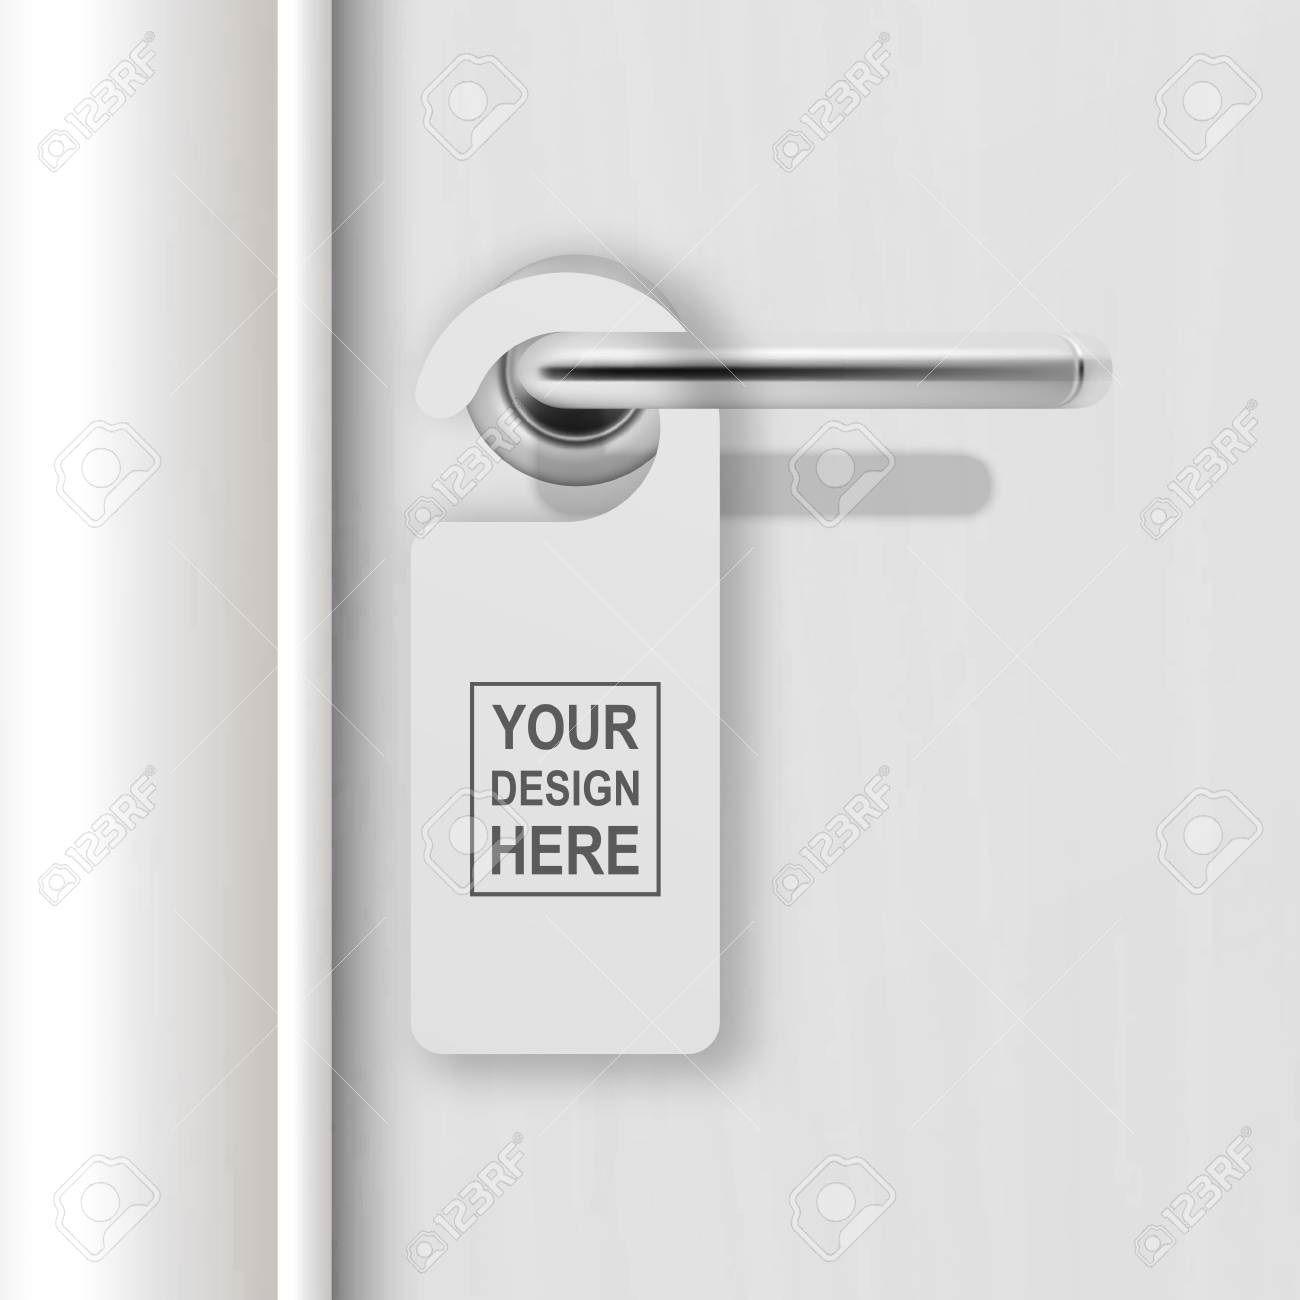 002 Amazing Blank Door Hanger Template High Definition  Free Printable Microsoft WordFull